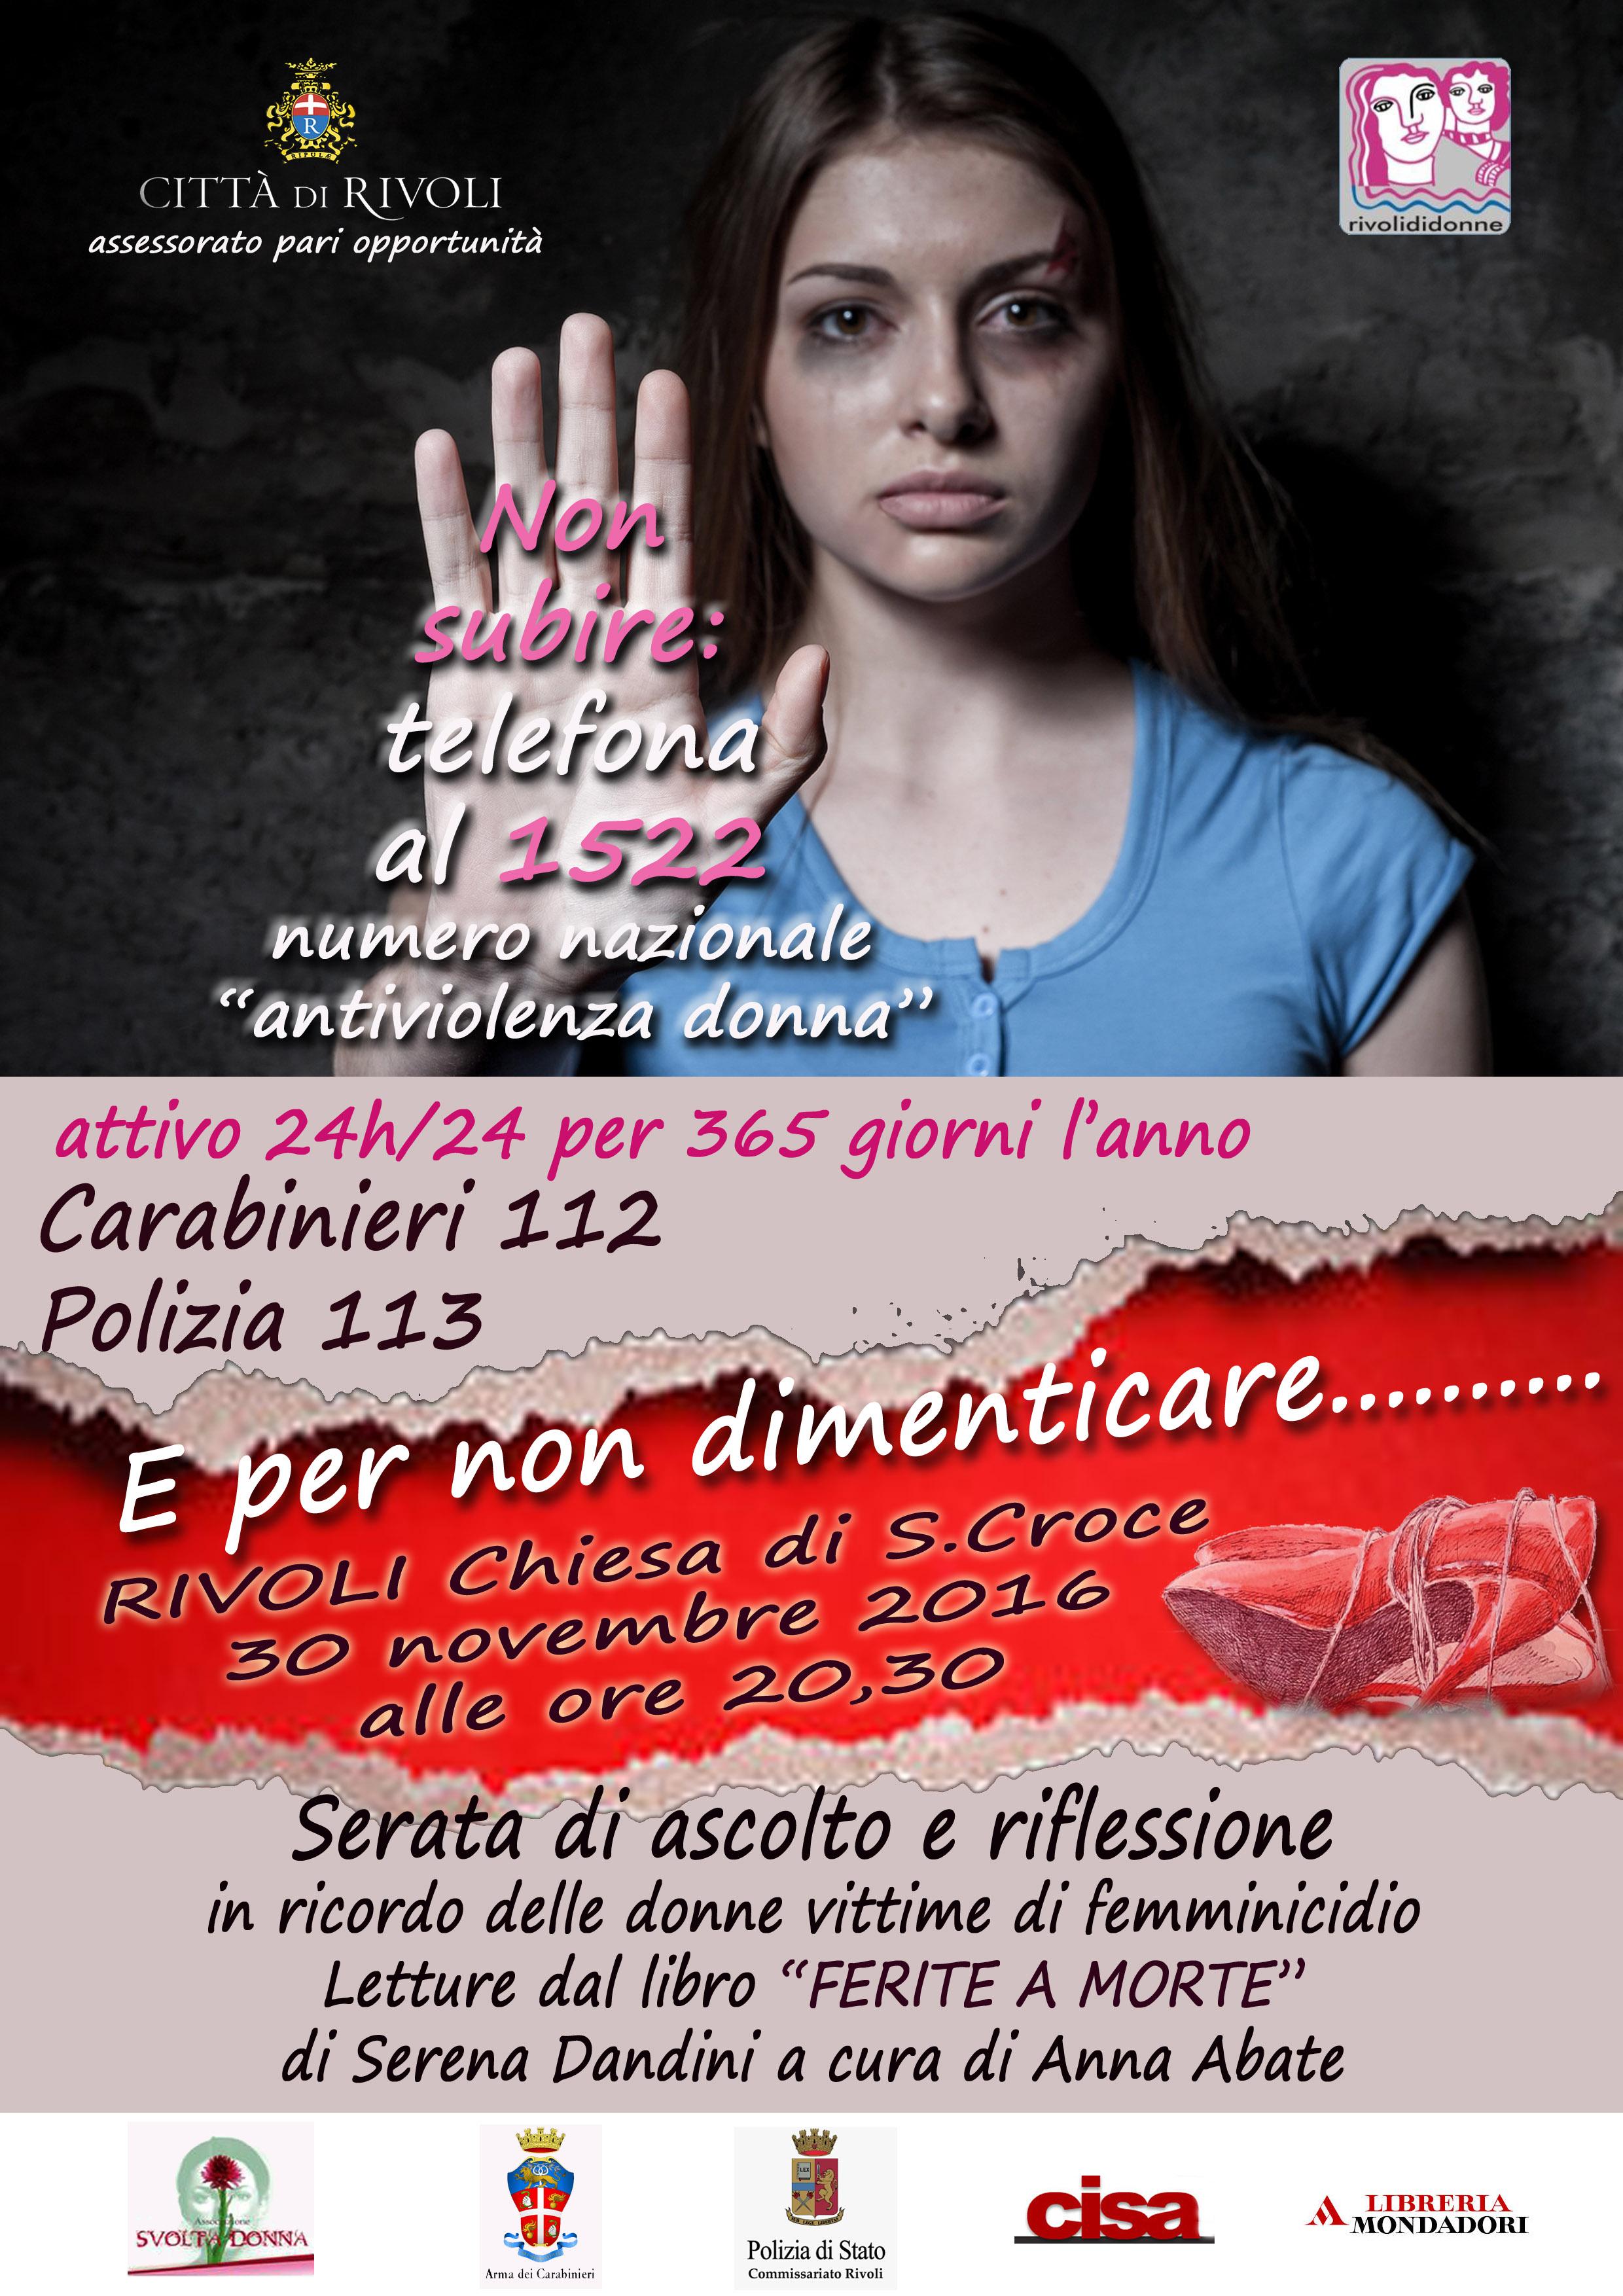 manifesto-2-11-2016-donne-vittime-di-femminicidio